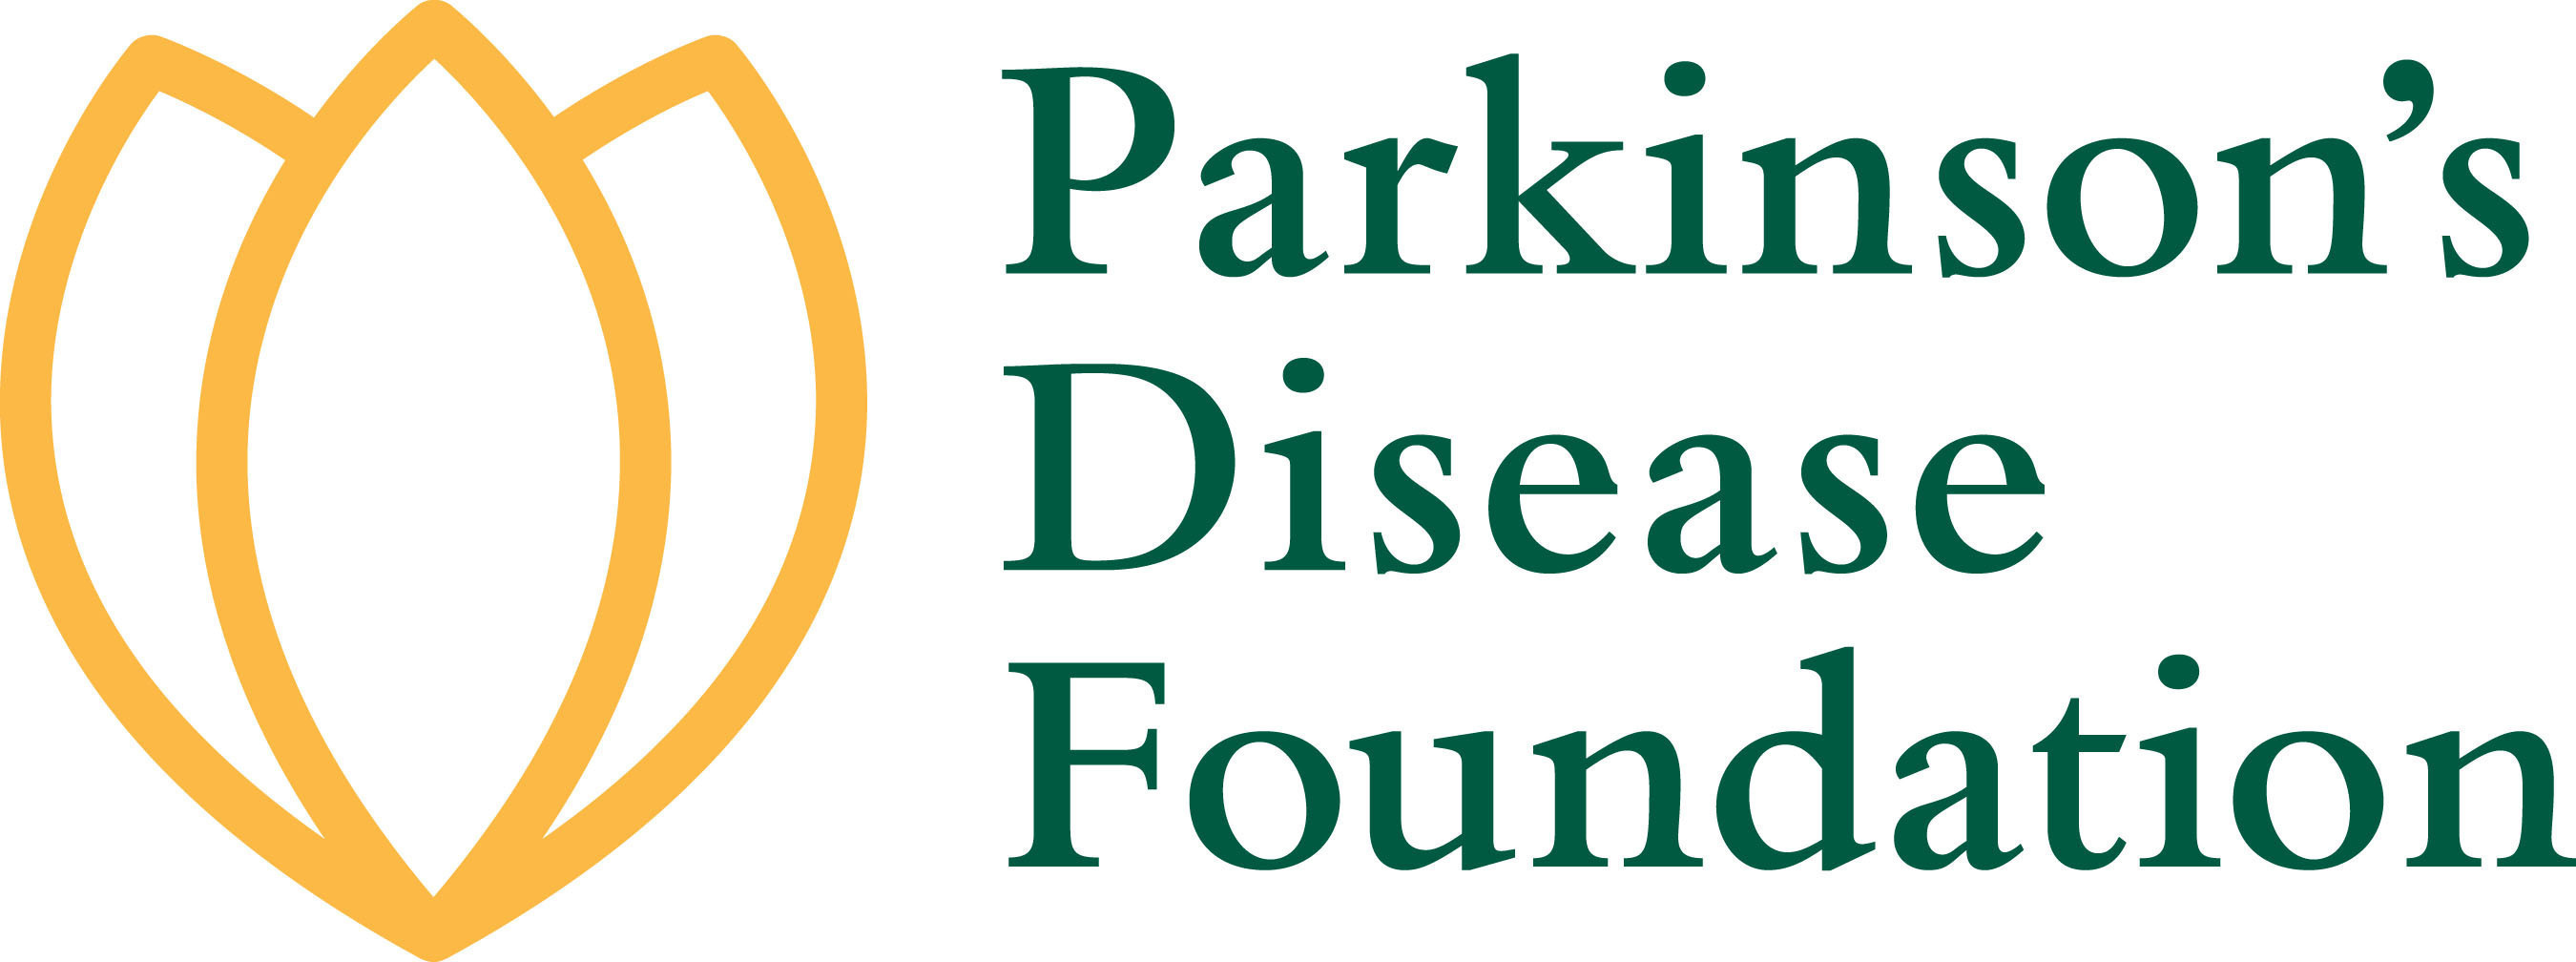 Parkinson's Disease Foundation logo.